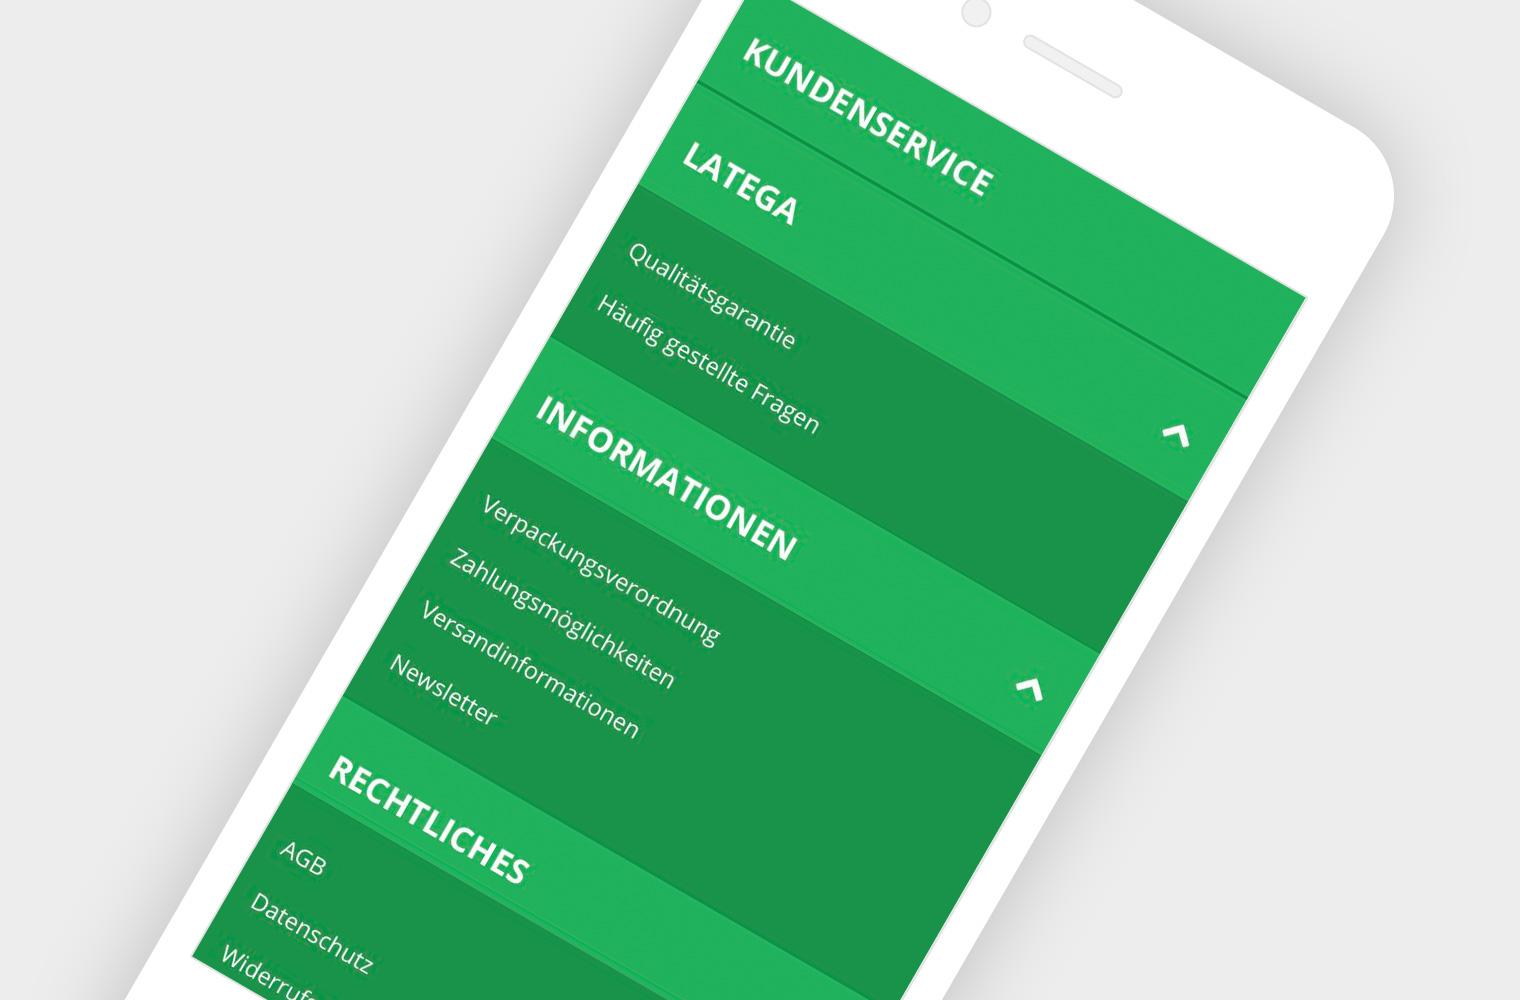 RIS Web- & Software Development - Projekt - Latega